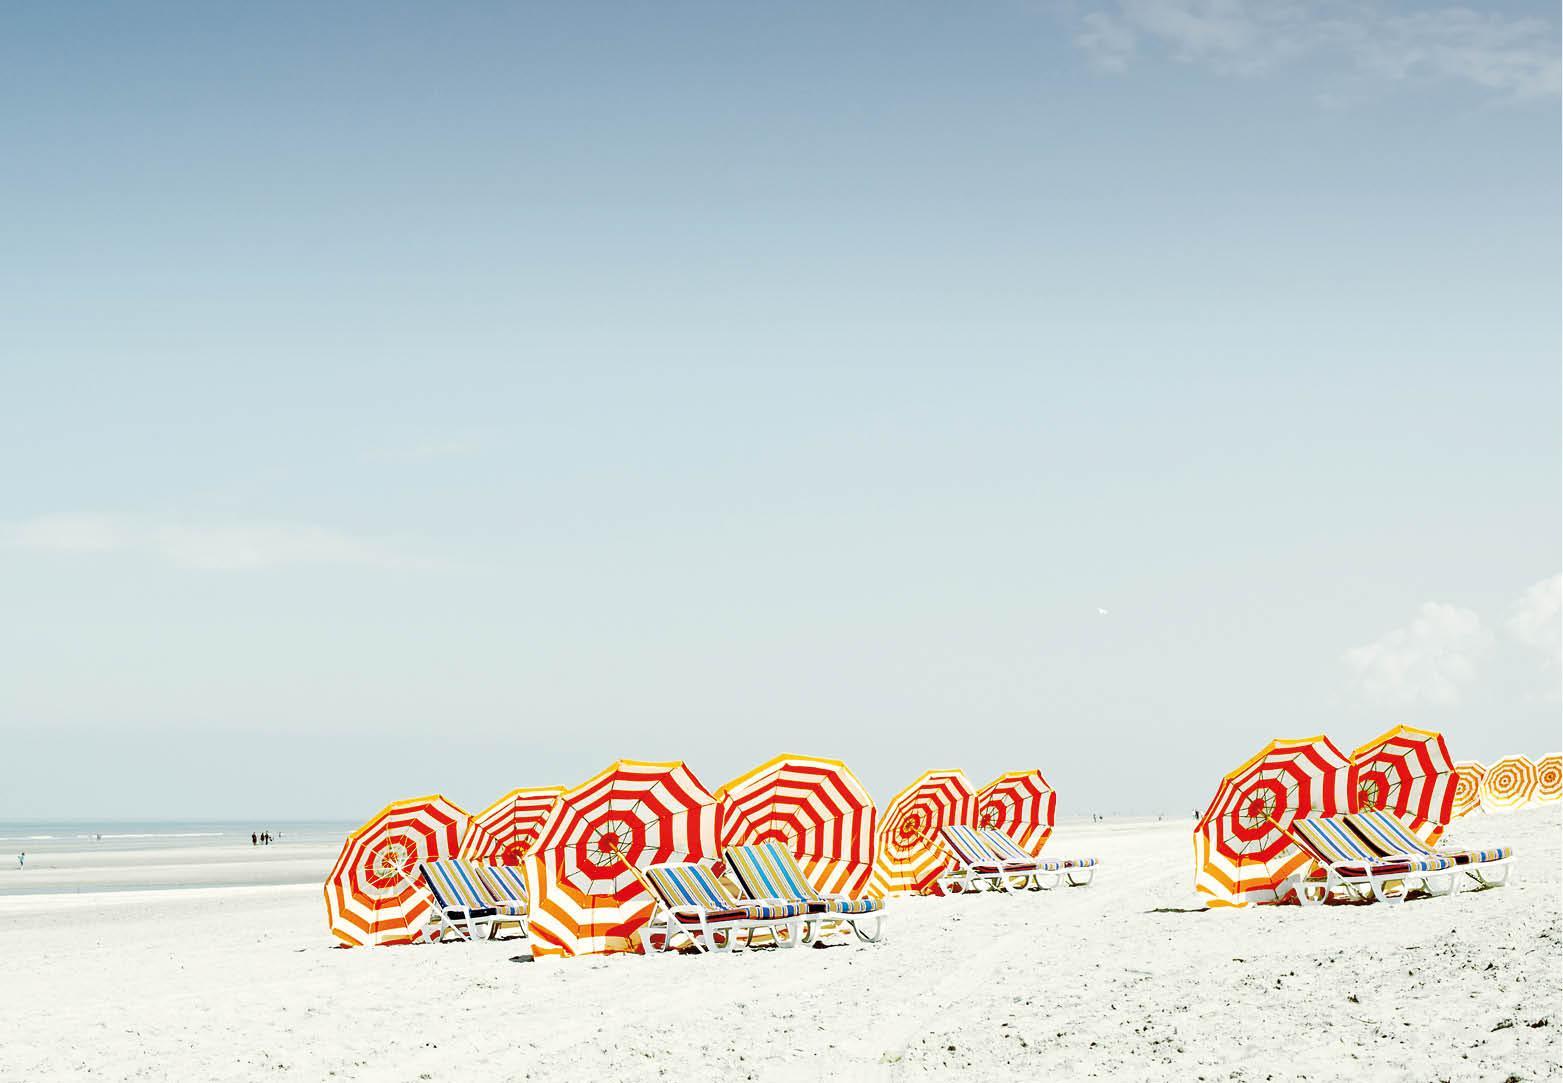 Dagje strand? Deze 5 items horen zeker in je strandtas